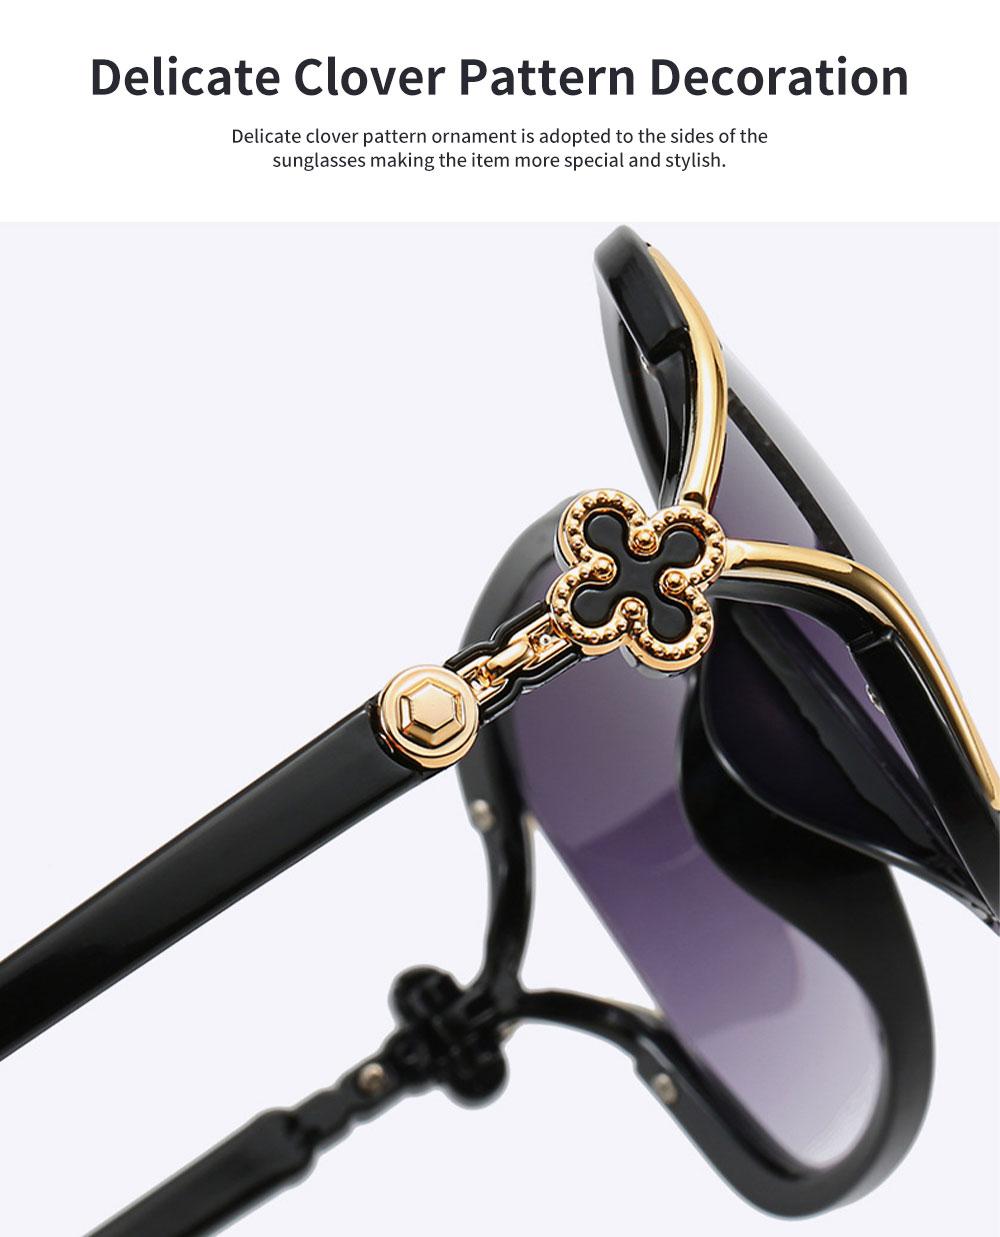 Elegant Fancy Gradient Eyeglasses Ladies Sunglasses UV Sunshine Protection Glasses with Delicate Hollow Clover Pattern Decoration 3